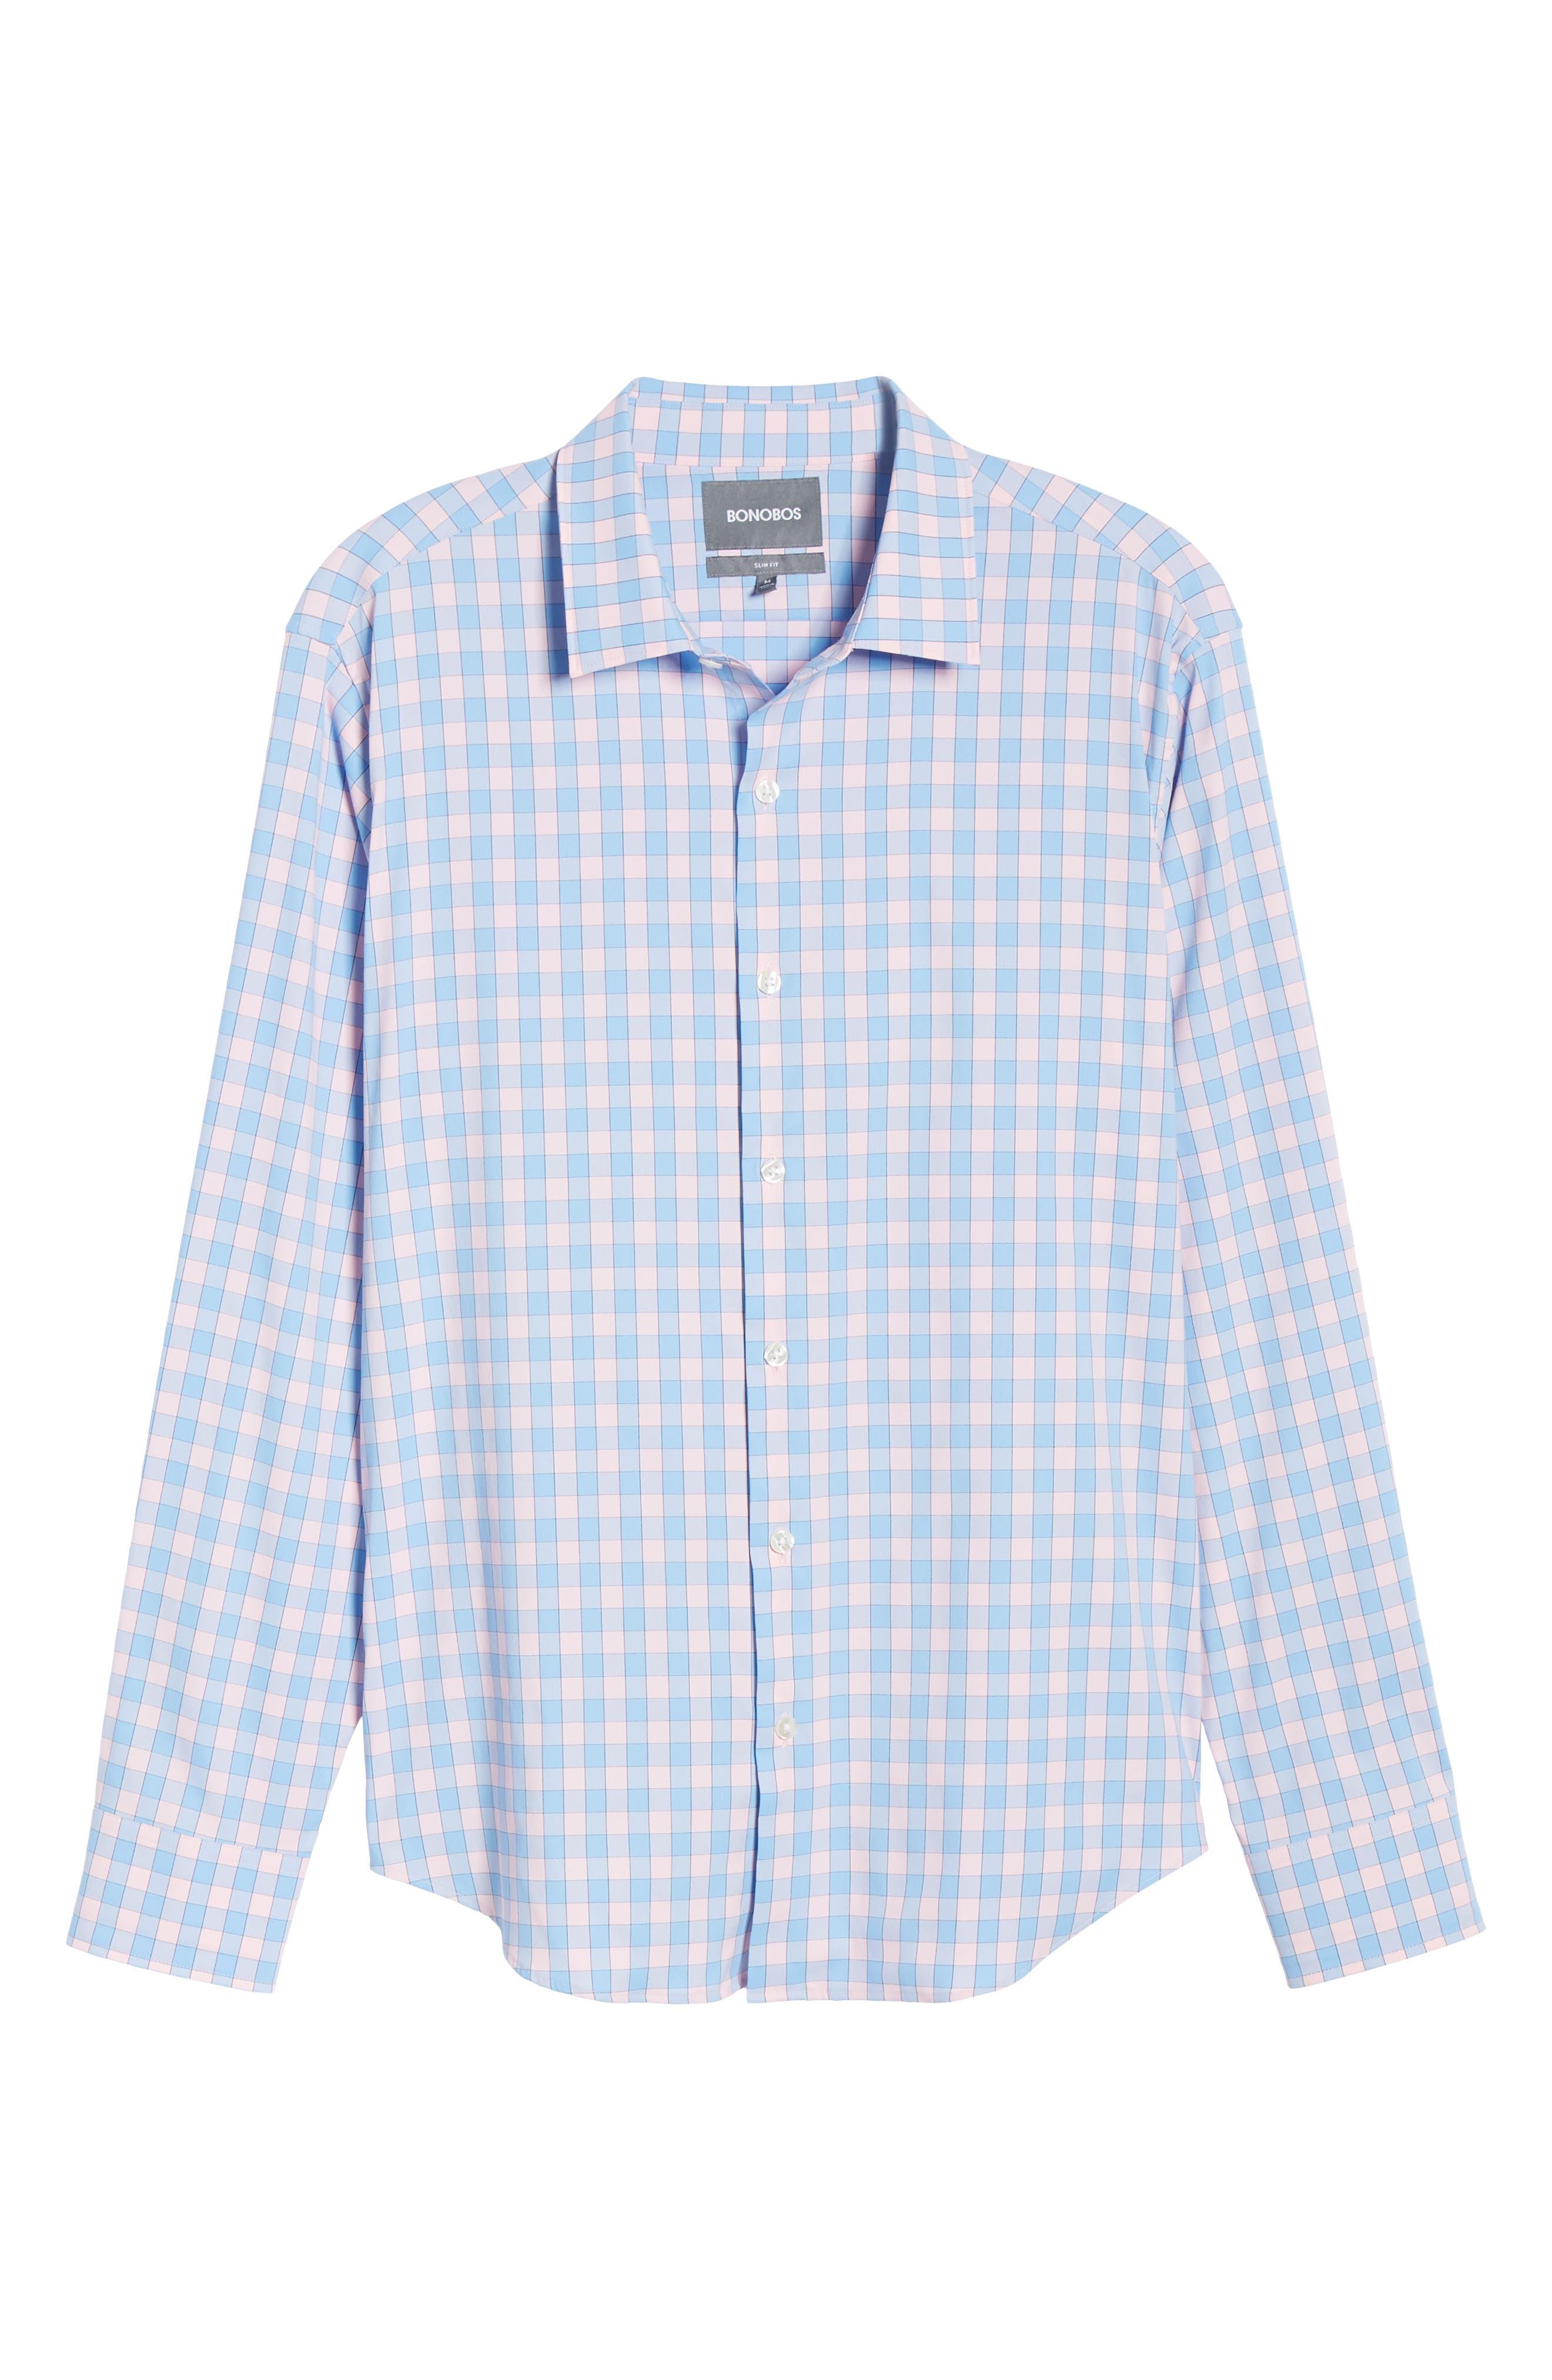 BONOBOS, Slim Fit Check Tech Sport Shirt, Alternate thumbnail 5, color, SAIL BOAT FIRST BLUSH